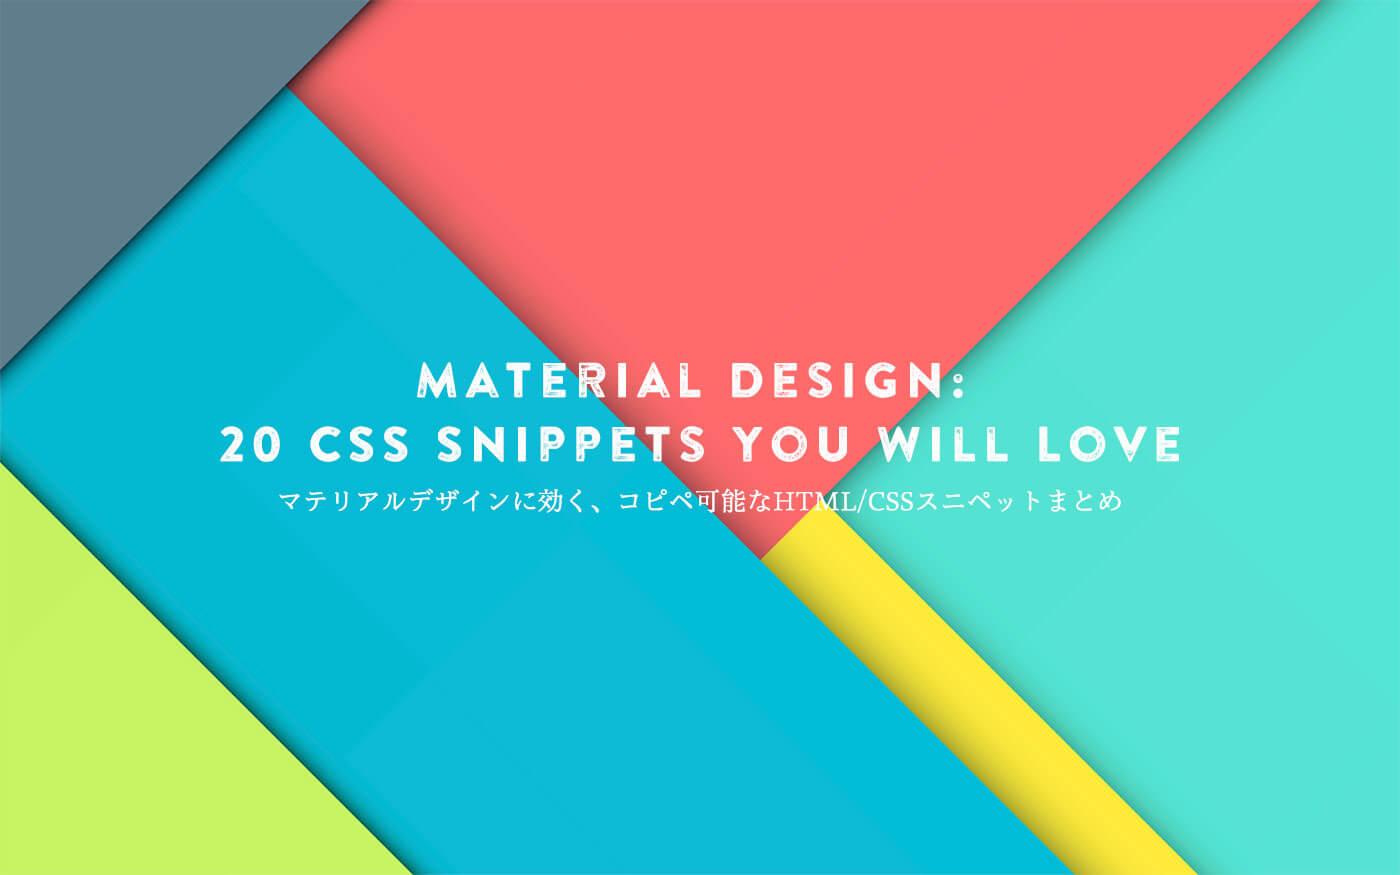 material-design-snippet-1